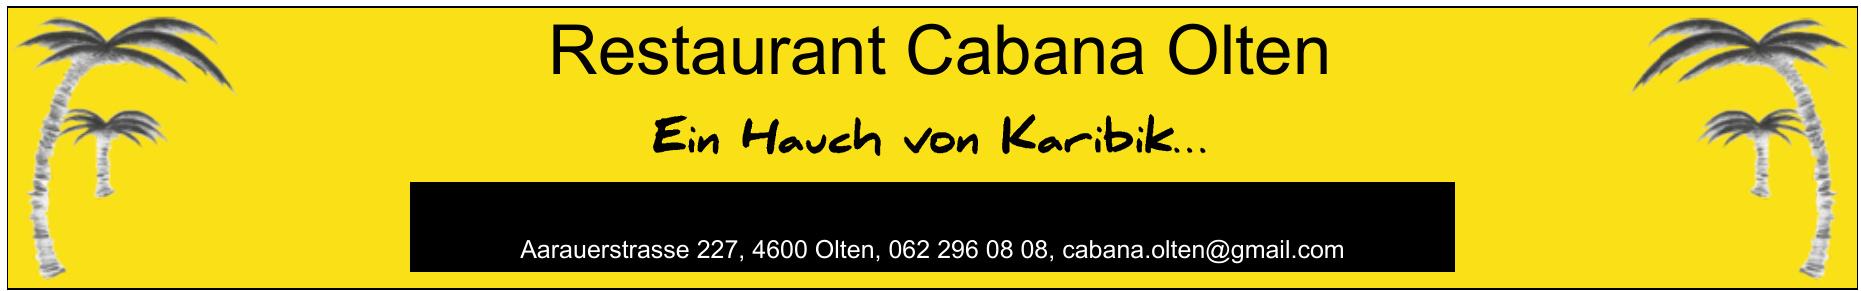 Restaurant Cabana Olten